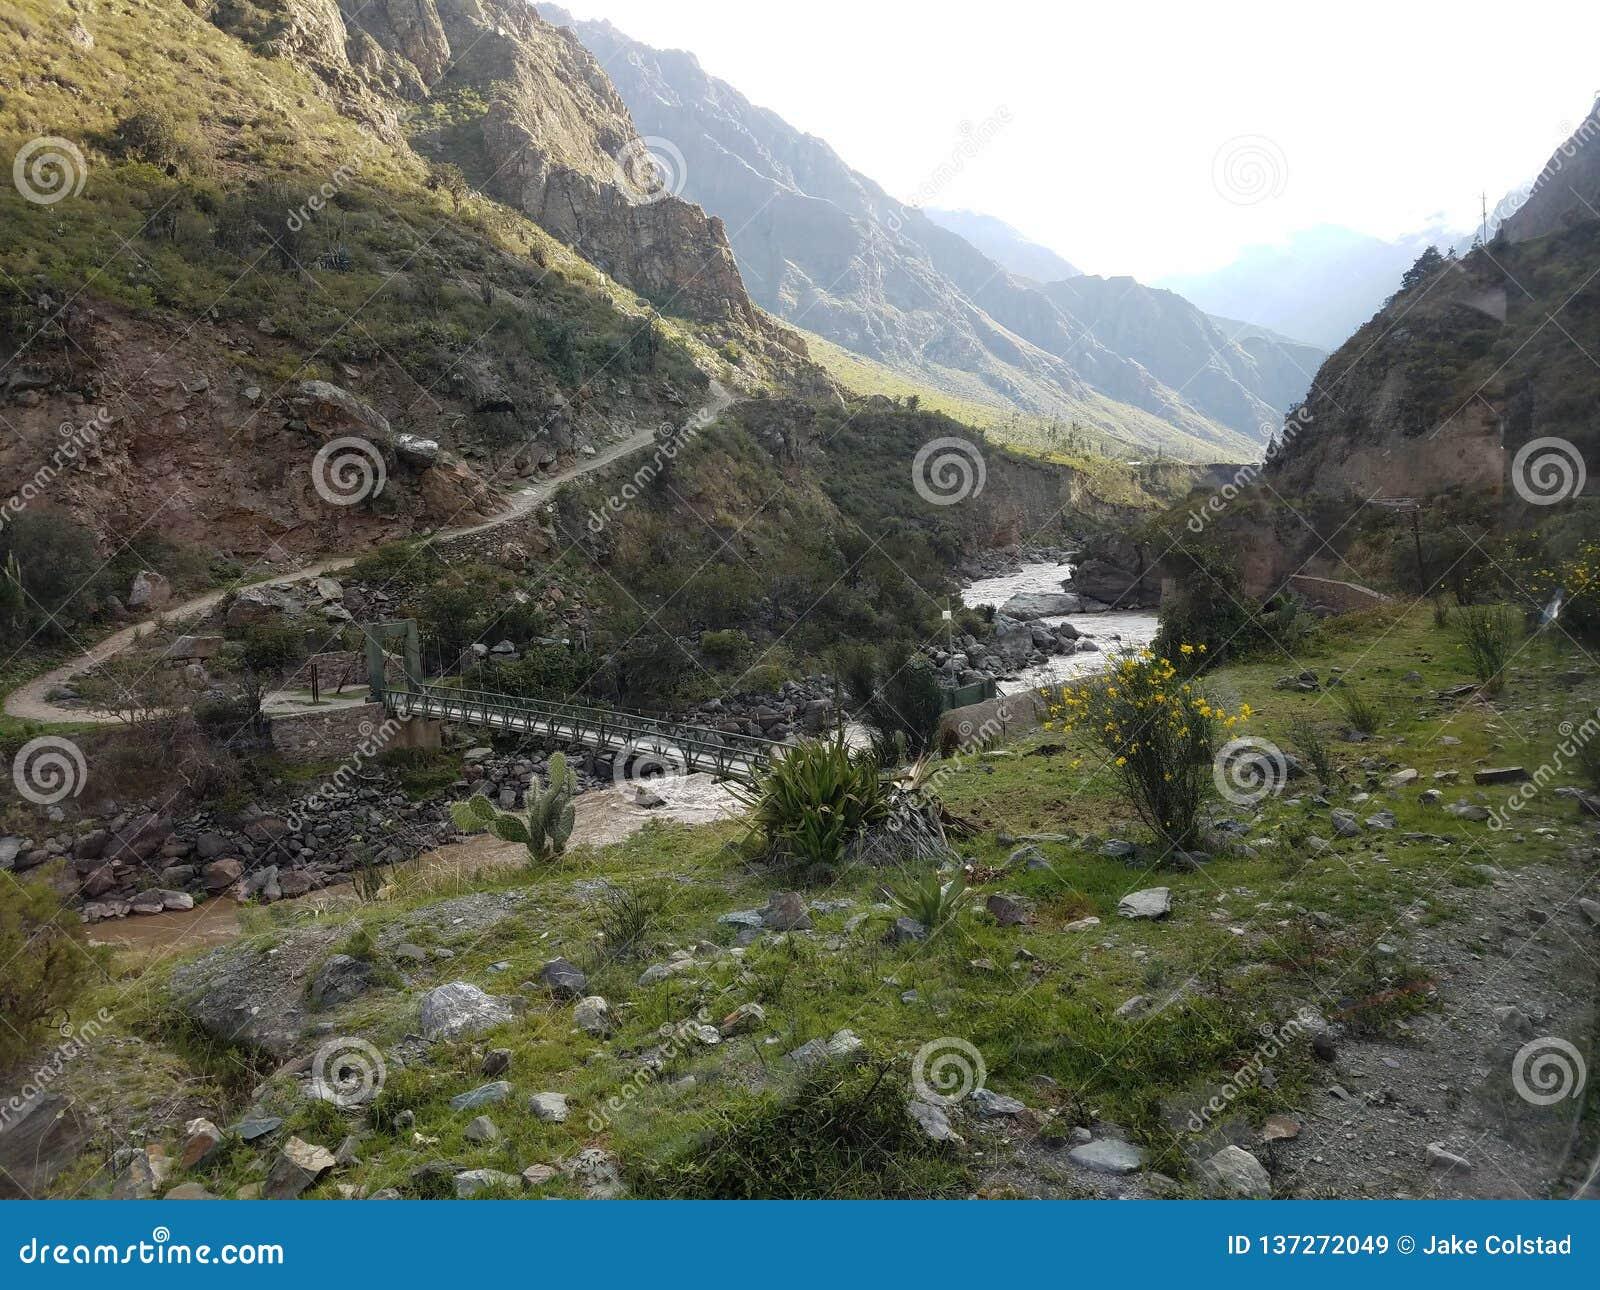 Bridge at the start of the Inca Trail